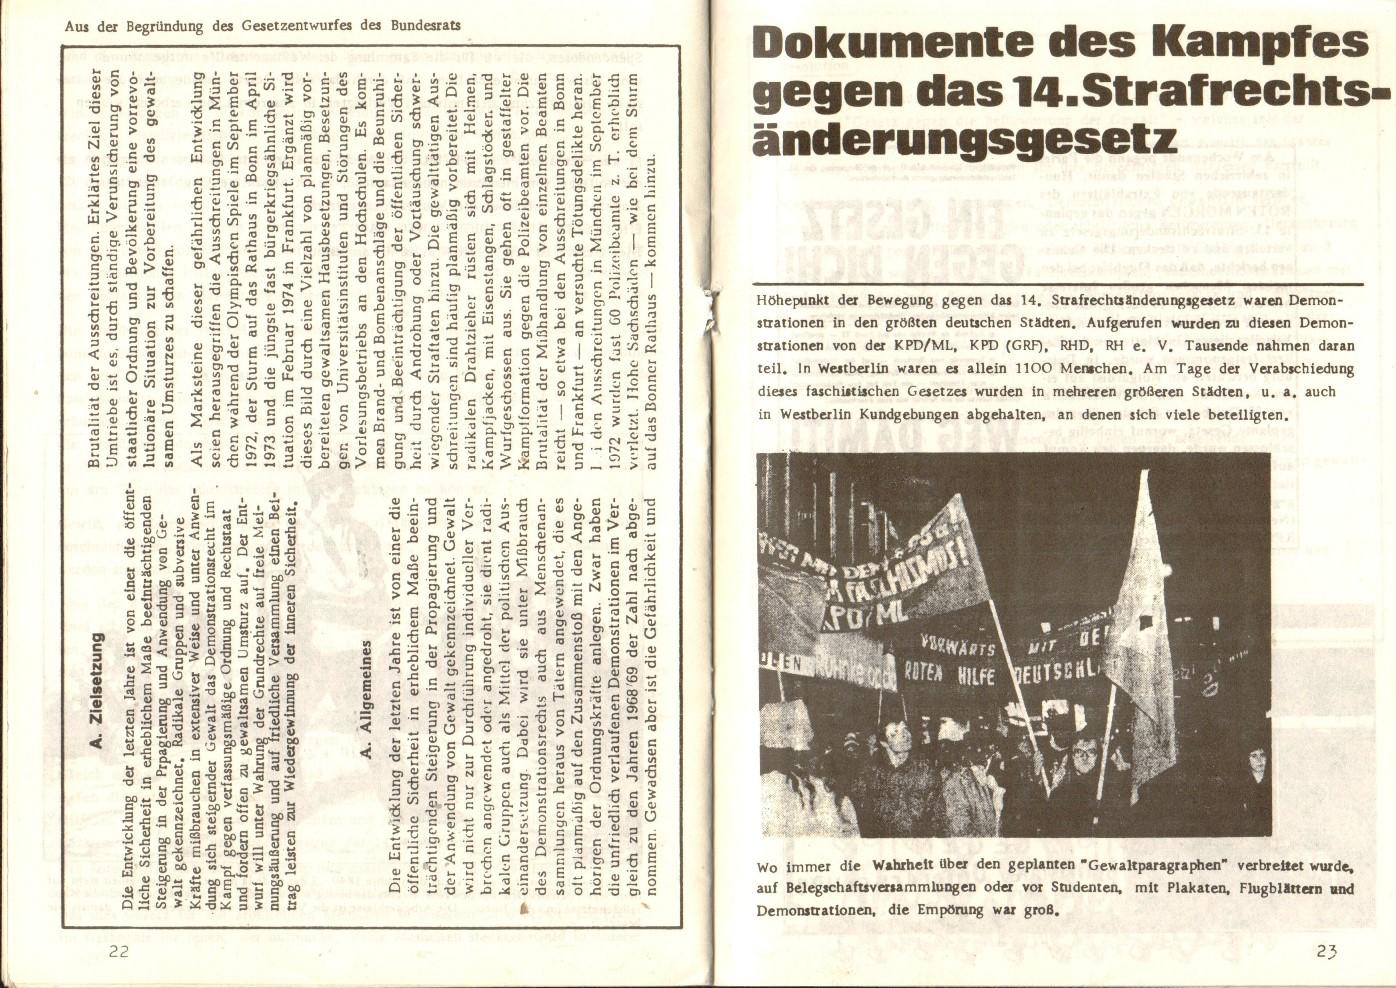 RHD_1976_Doku_Strafrechtsaenderungsgesetz_12